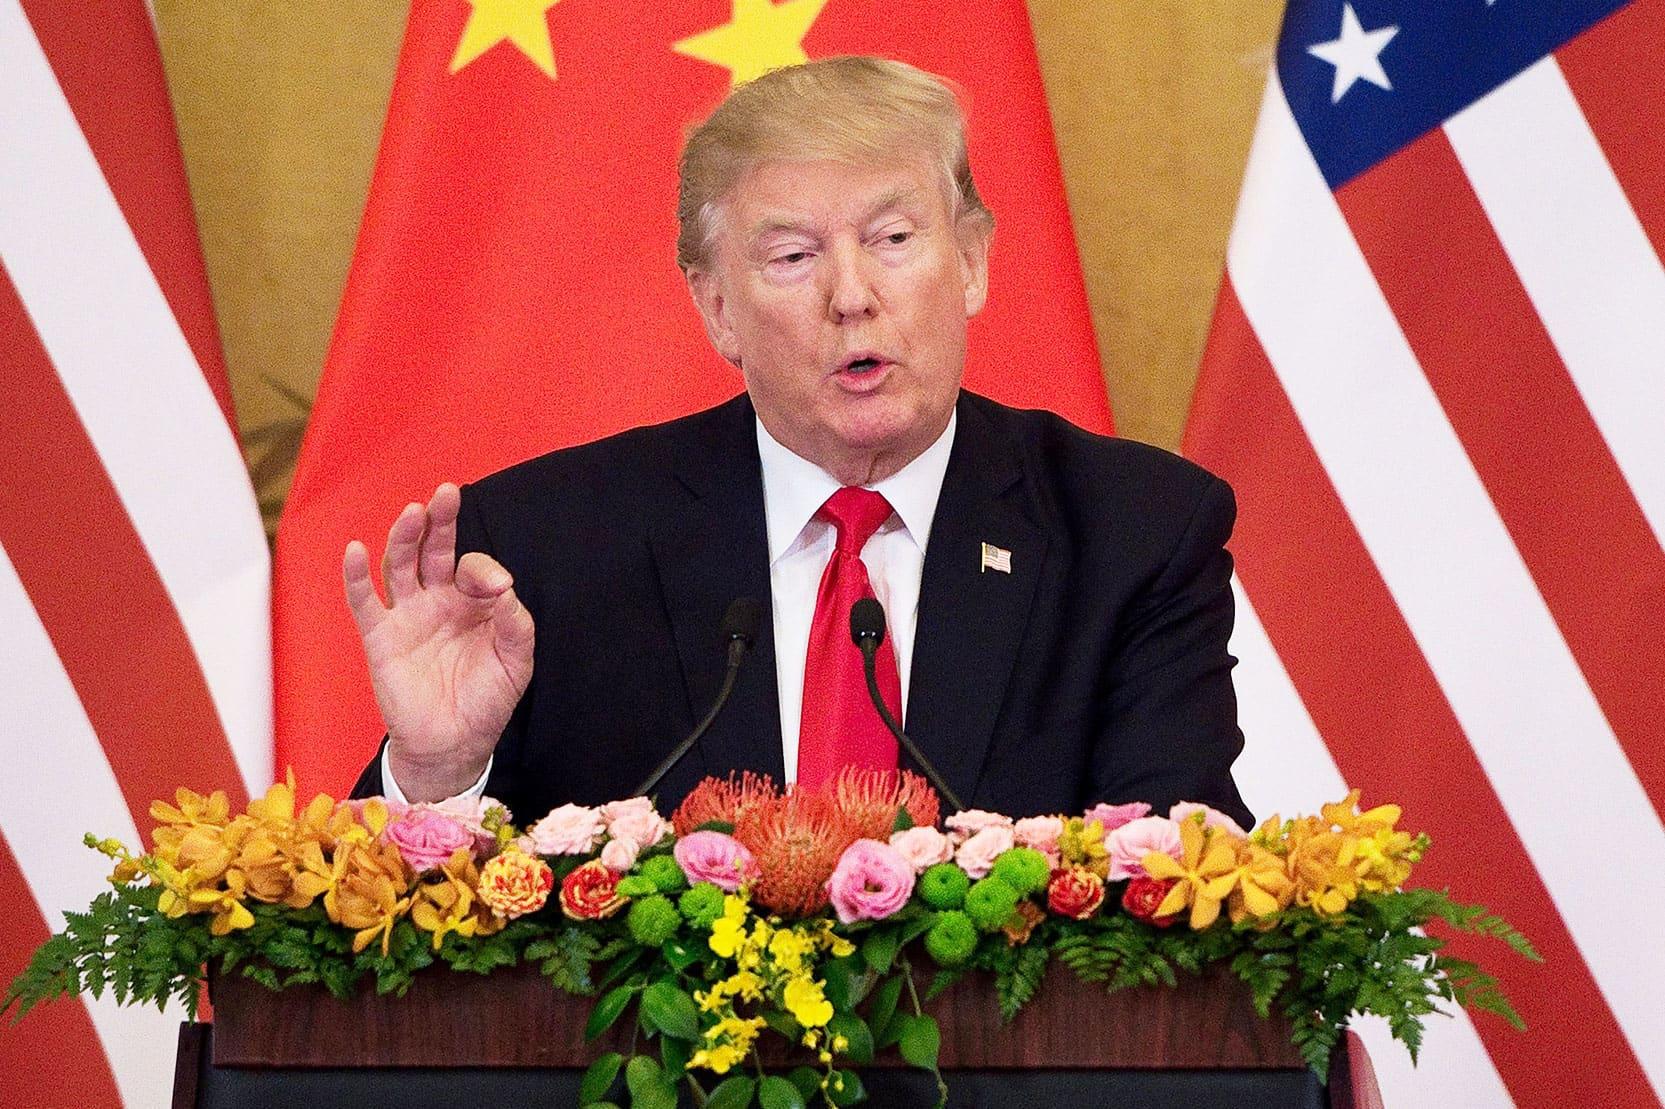 Trump tariffs costing US consumers $1.4 billion per month, study shows